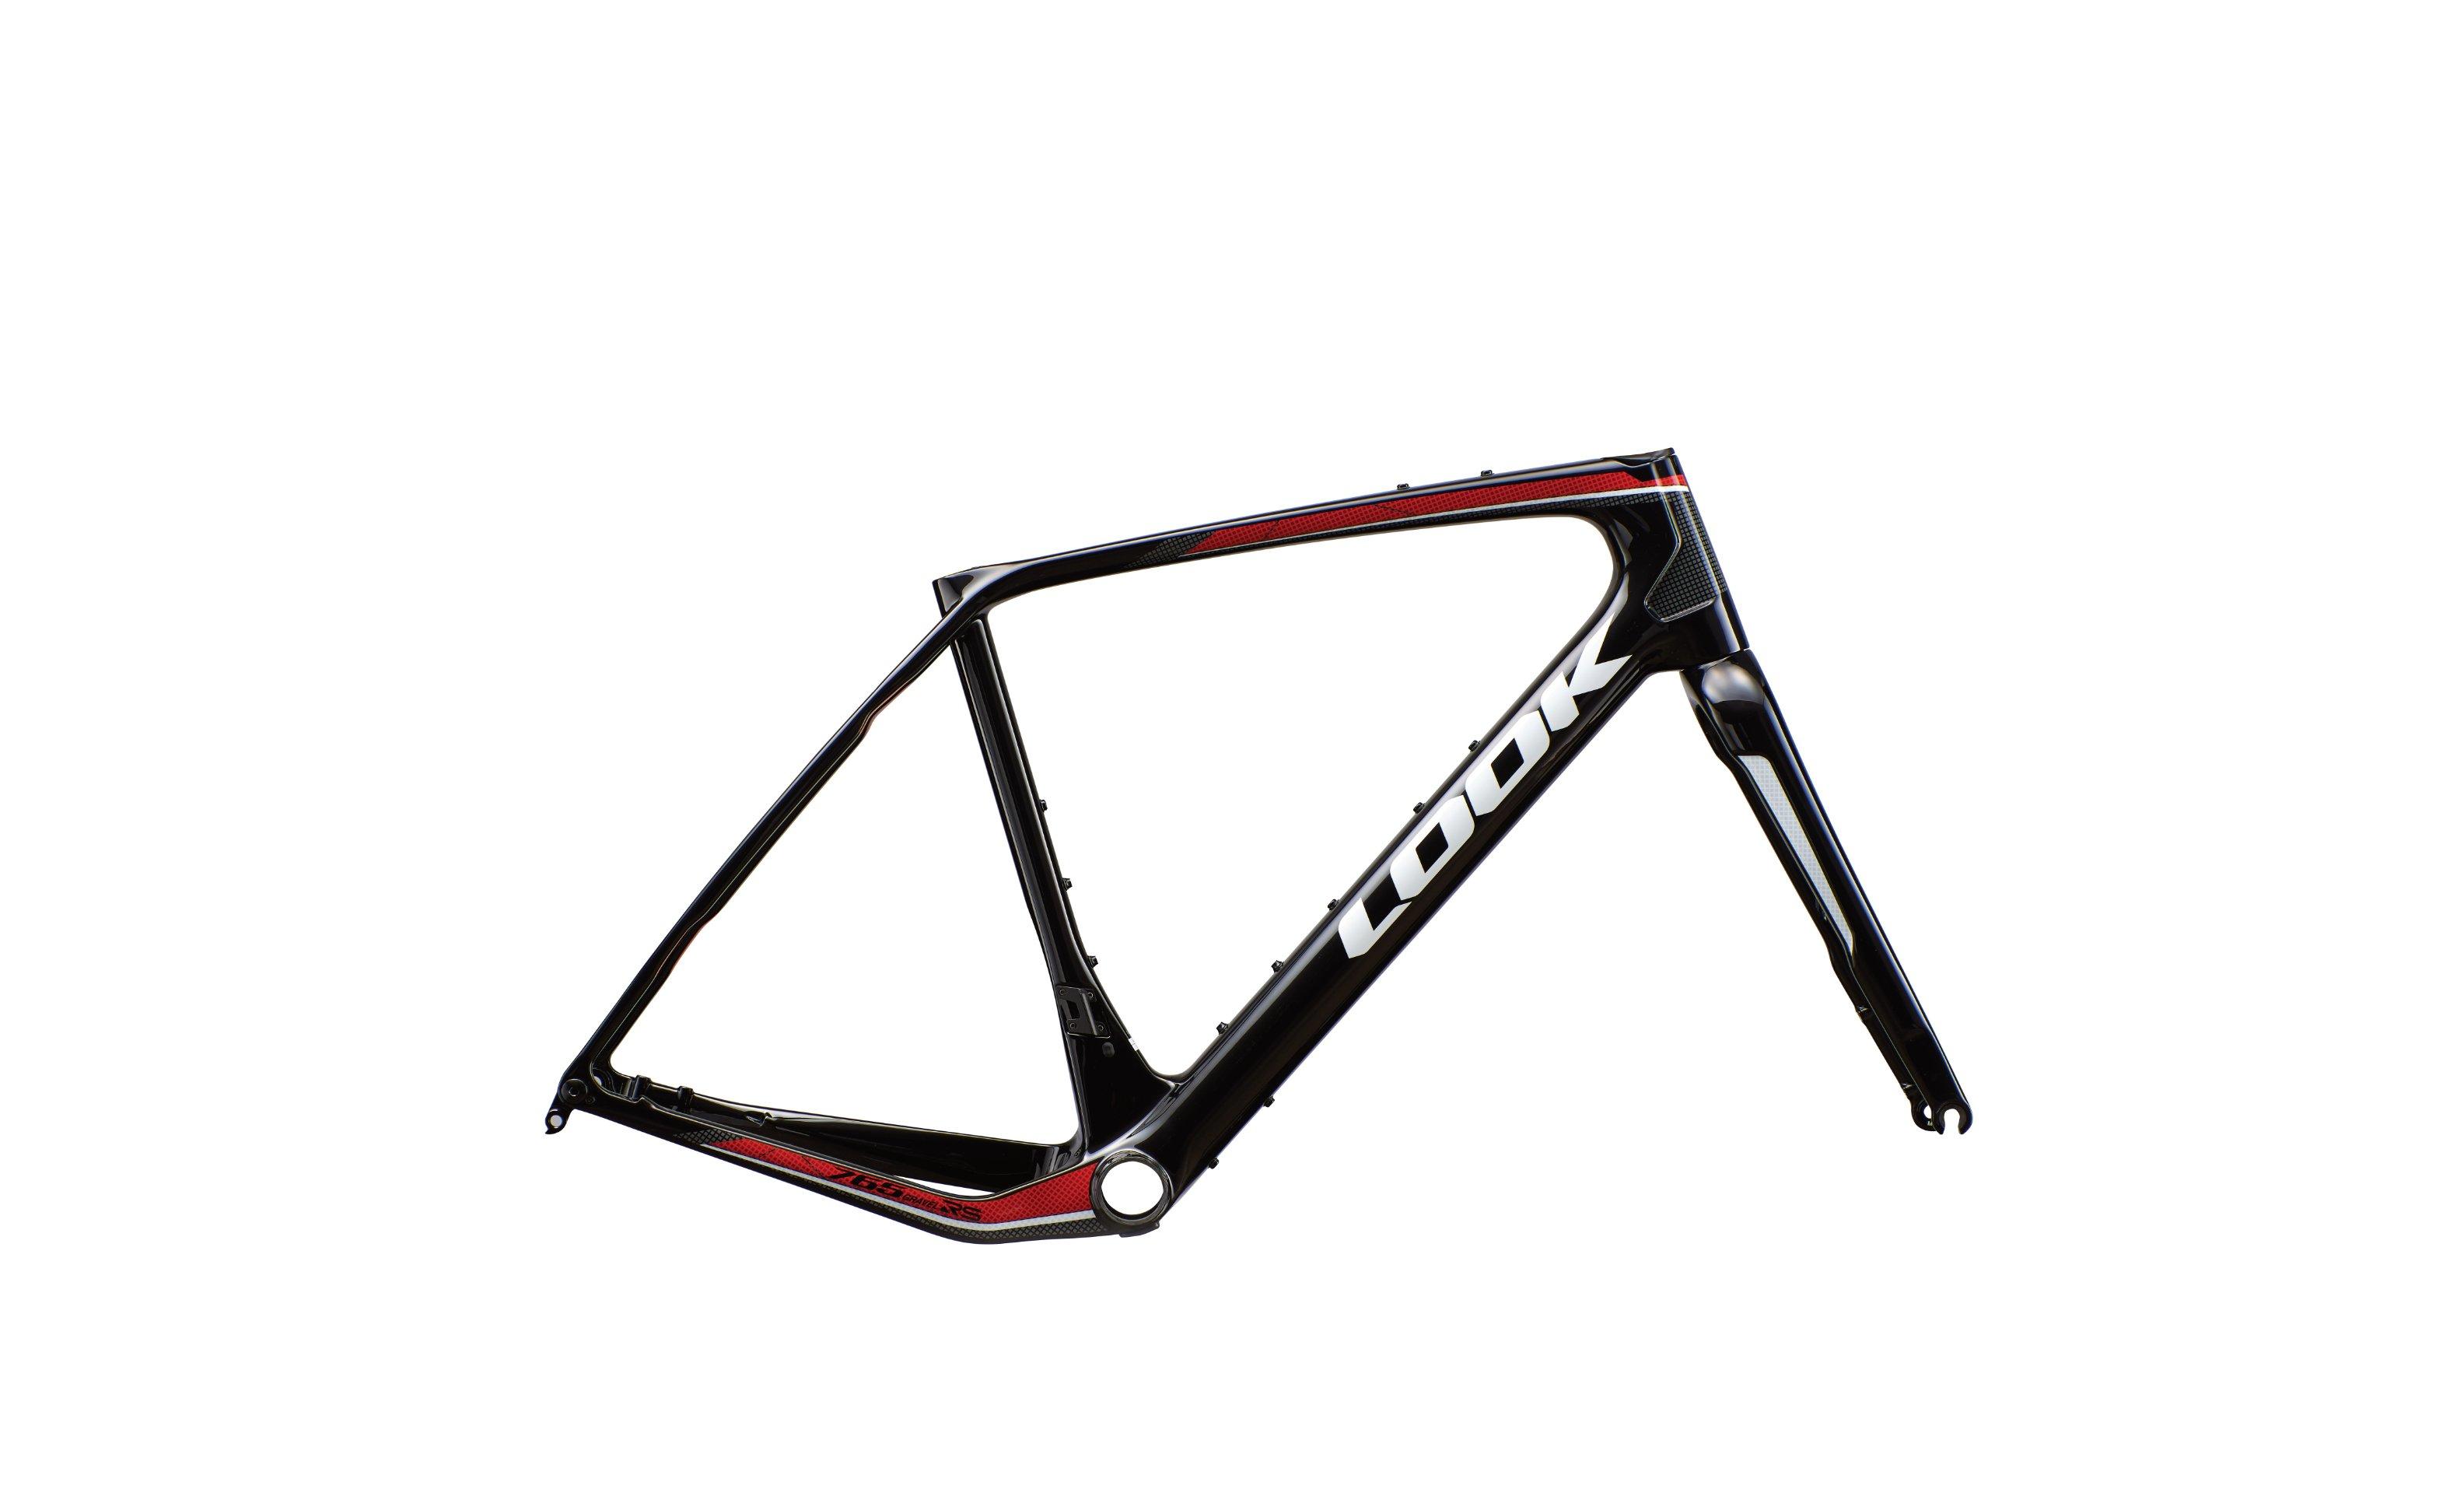 765-gravel-rs-black-red-glossy